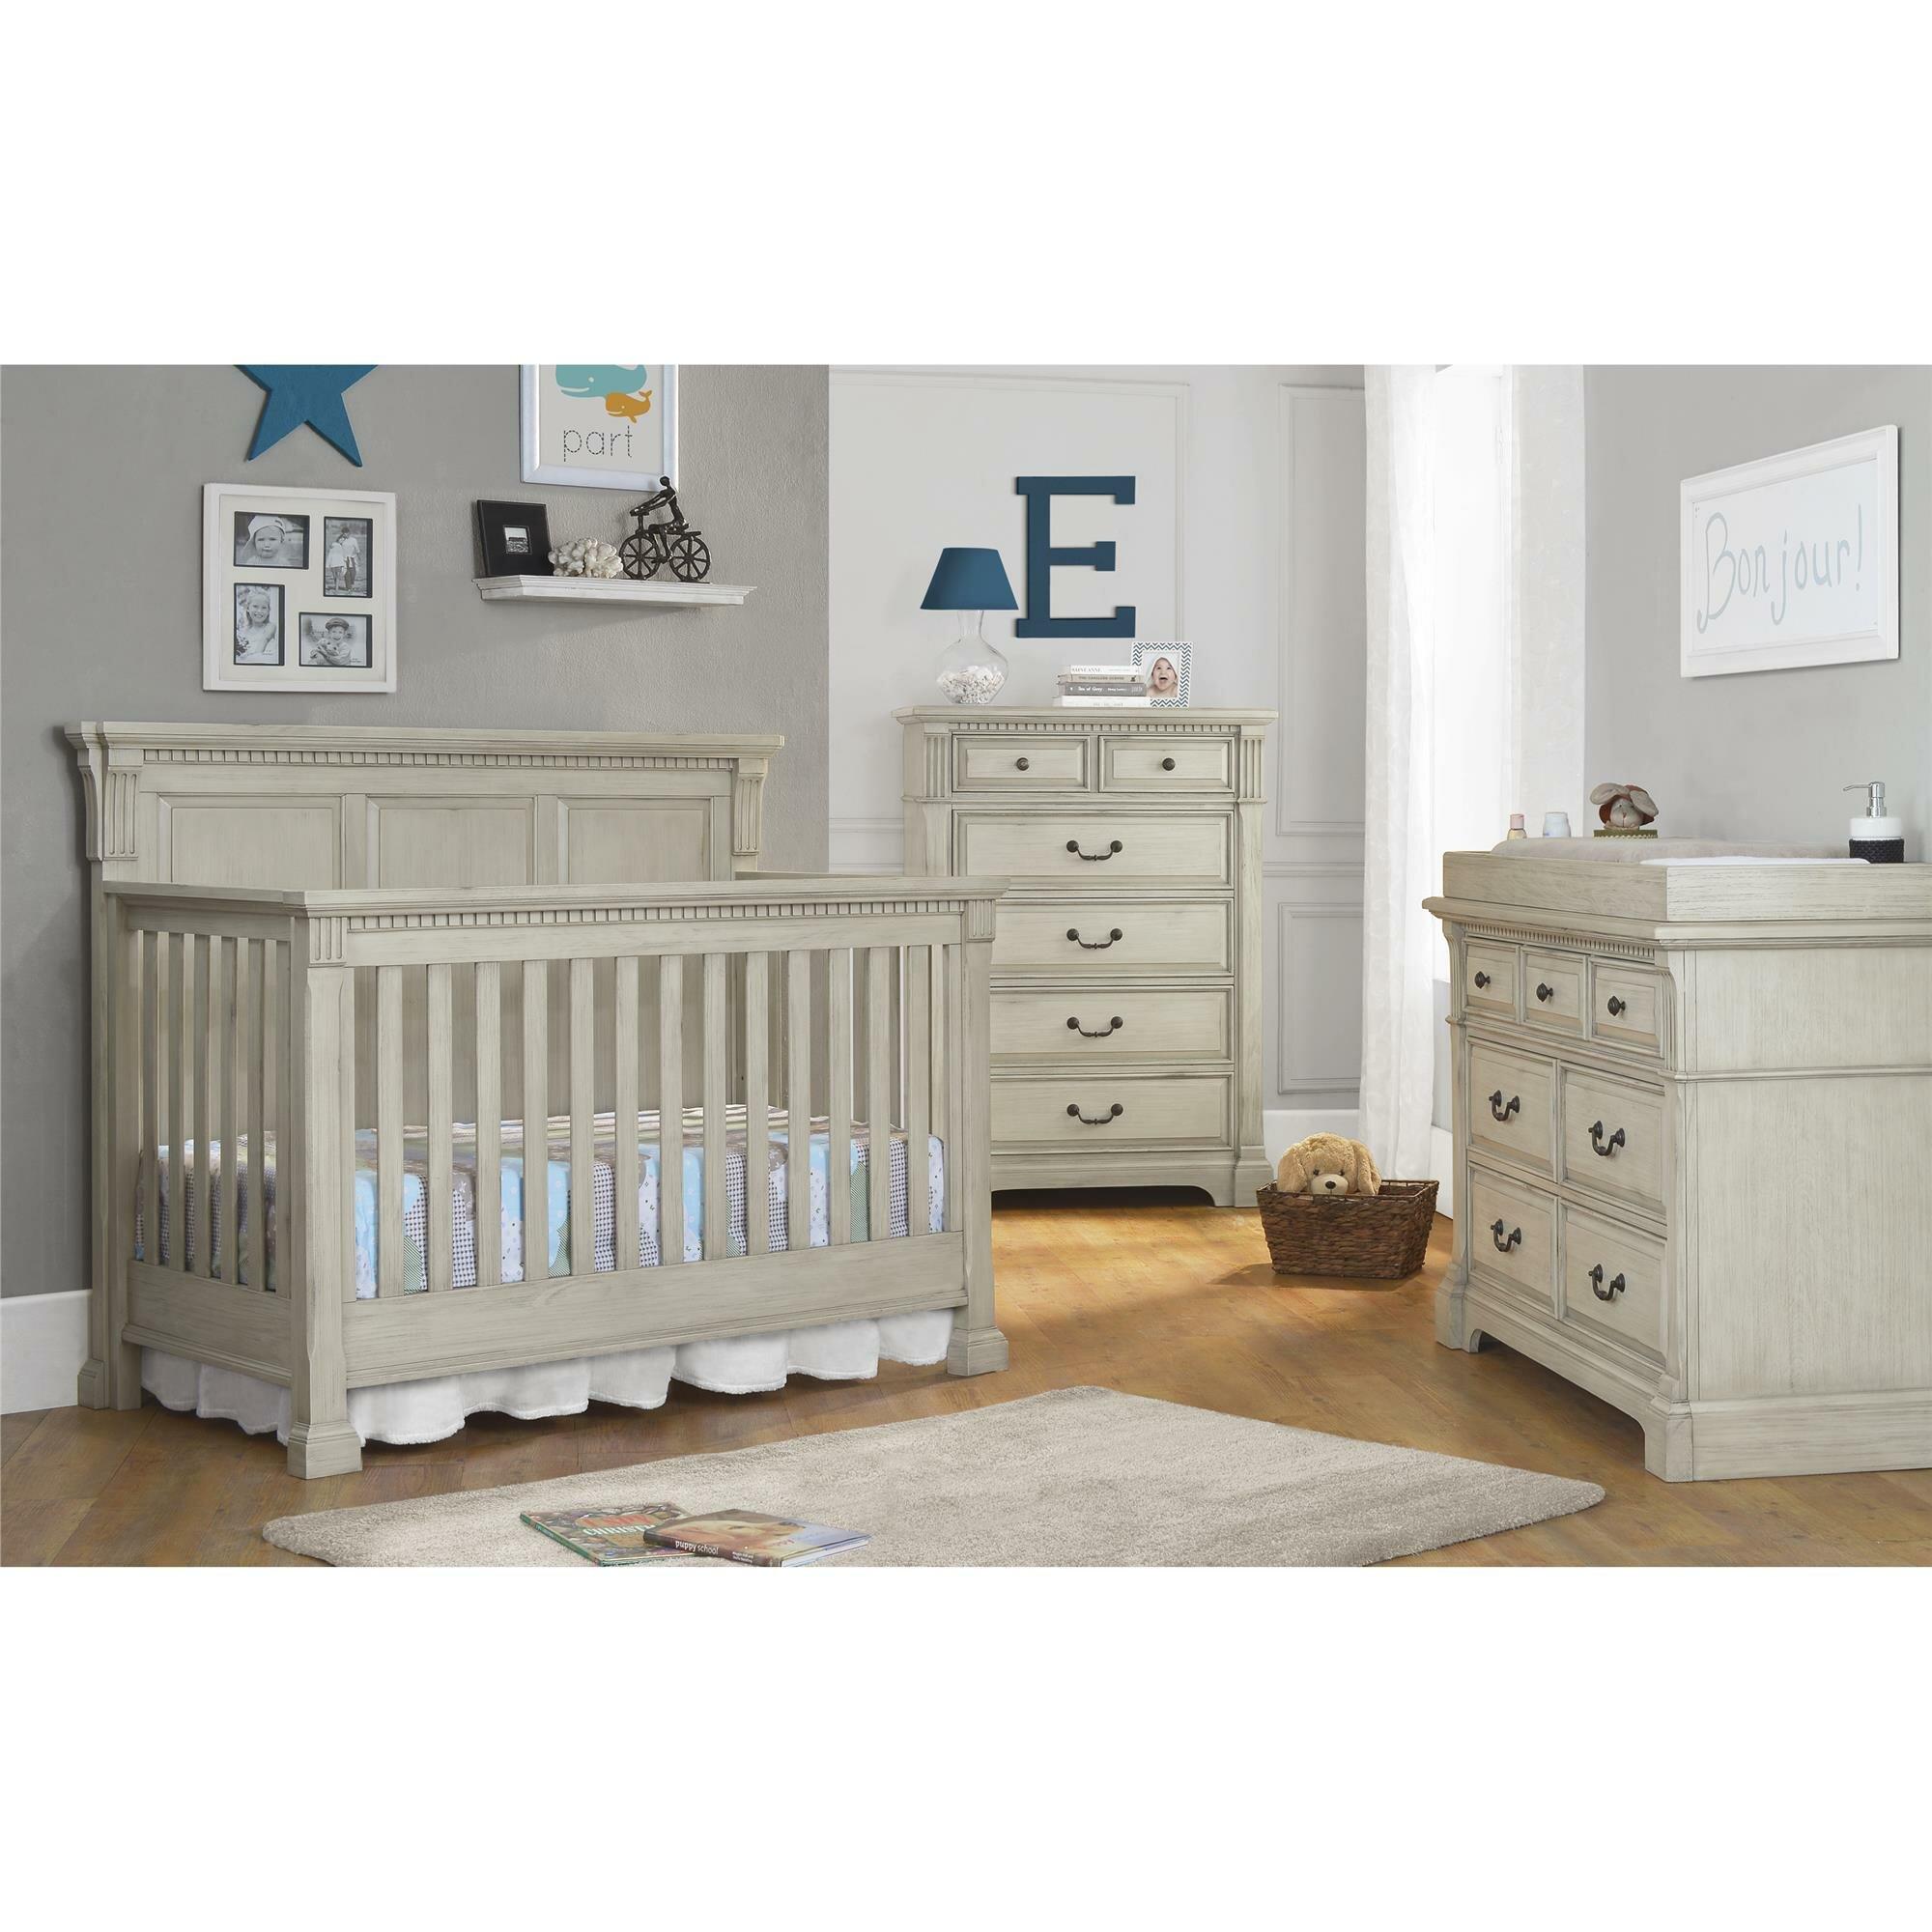 Baby cribs richmond va - Viv Rae Trade Ririe 4 In 1 Convertible Crib